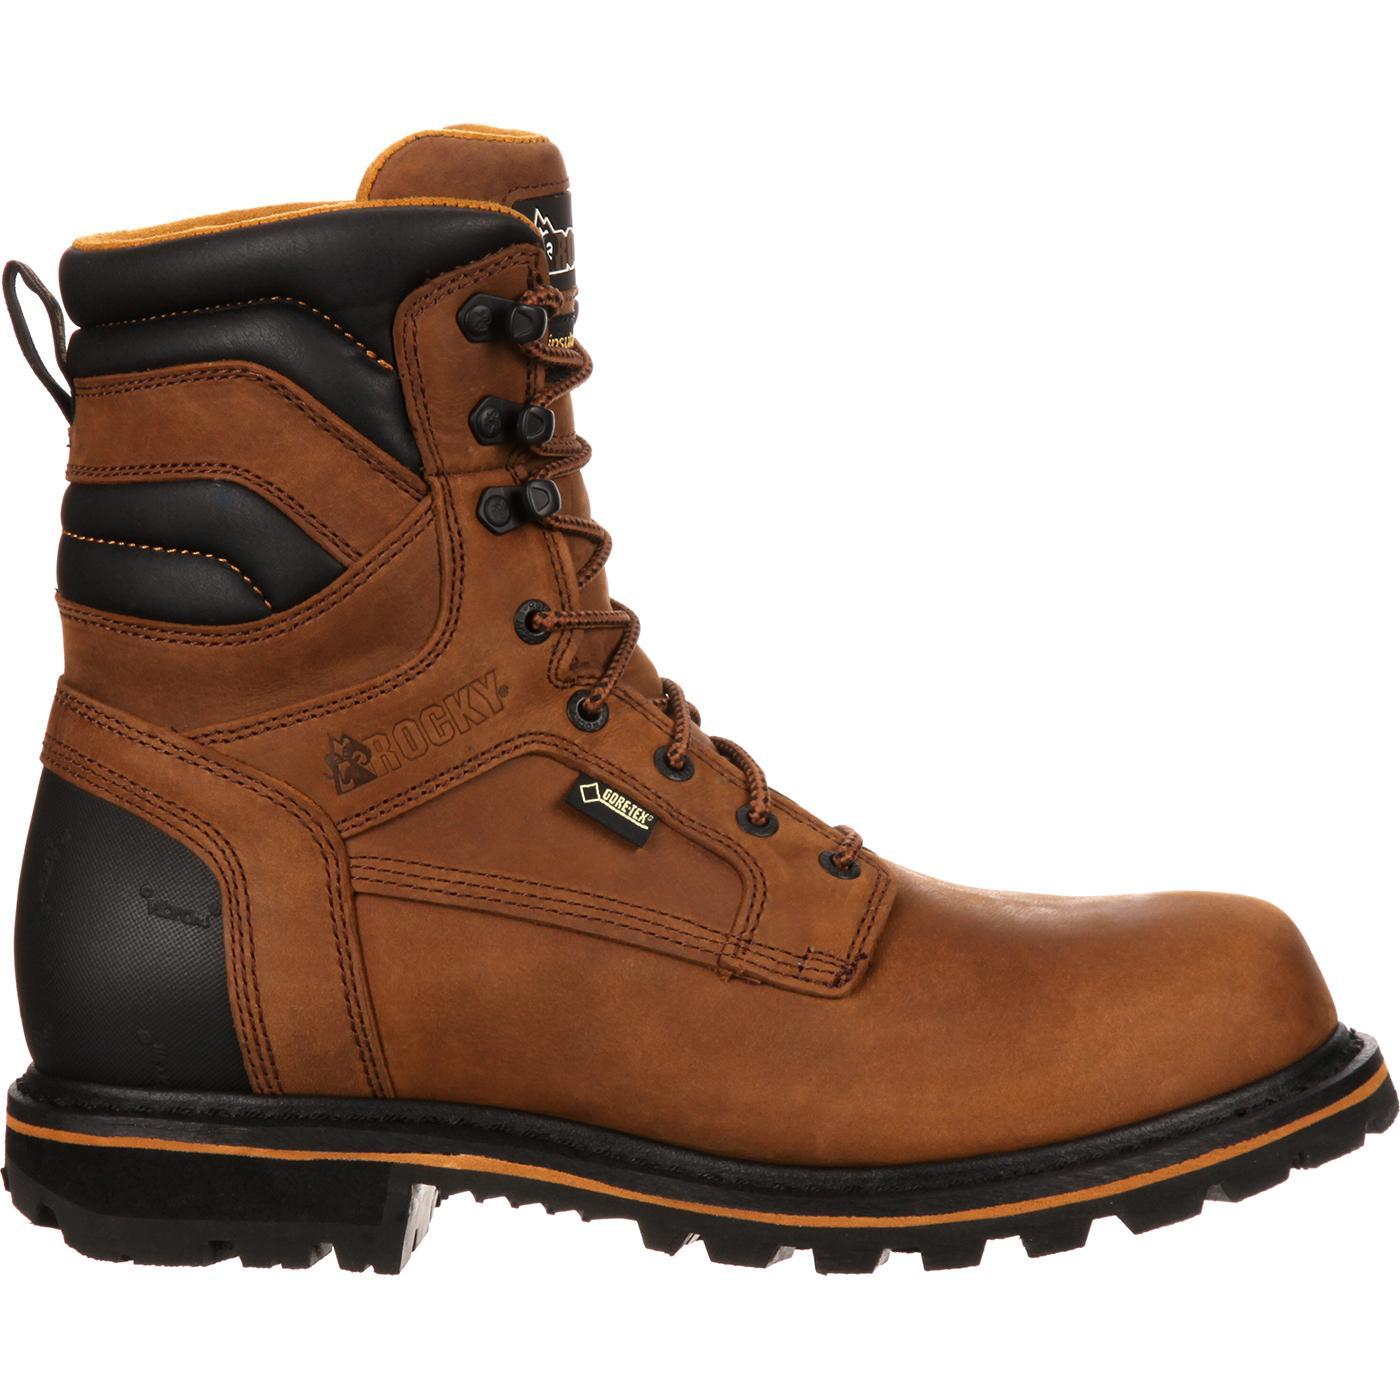 c922bdecc35 Rocky Governor GORE-TEX® Insulated Work Boot